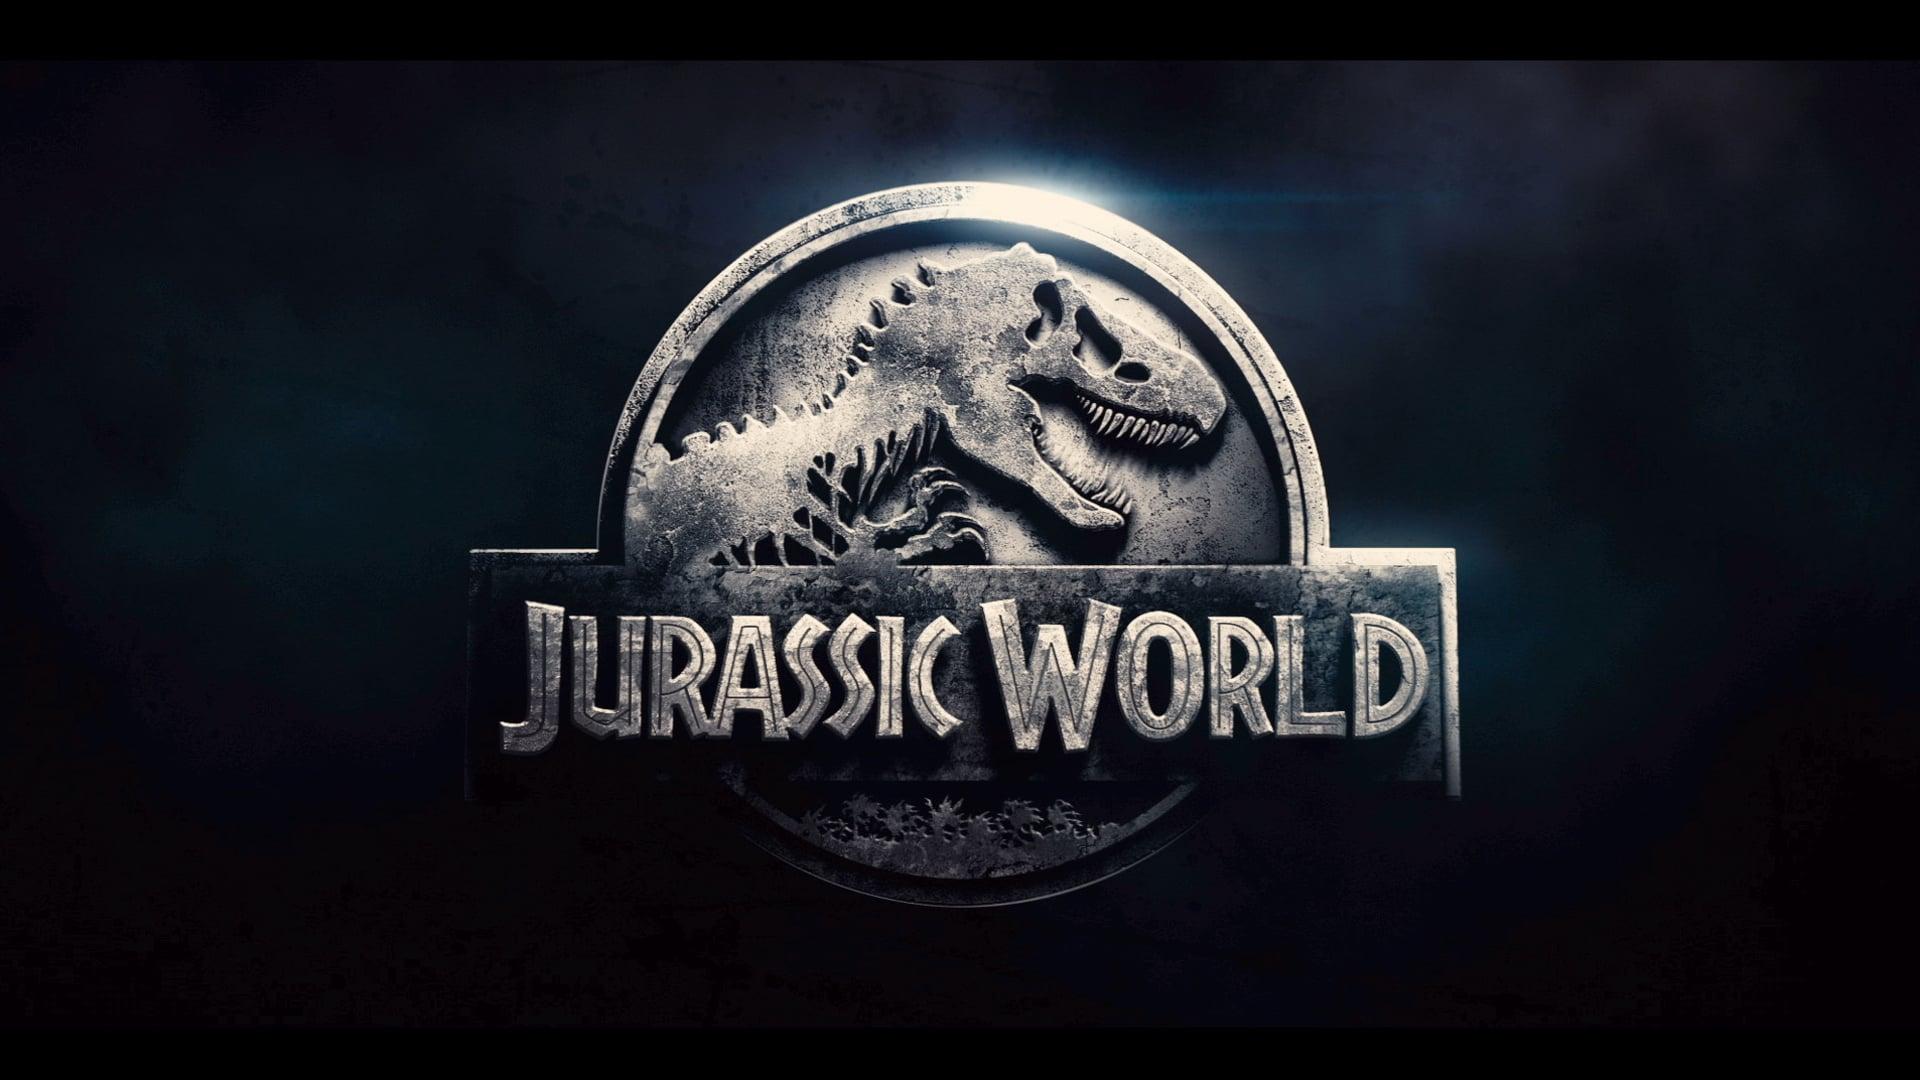 Jurassic World   A New Vision